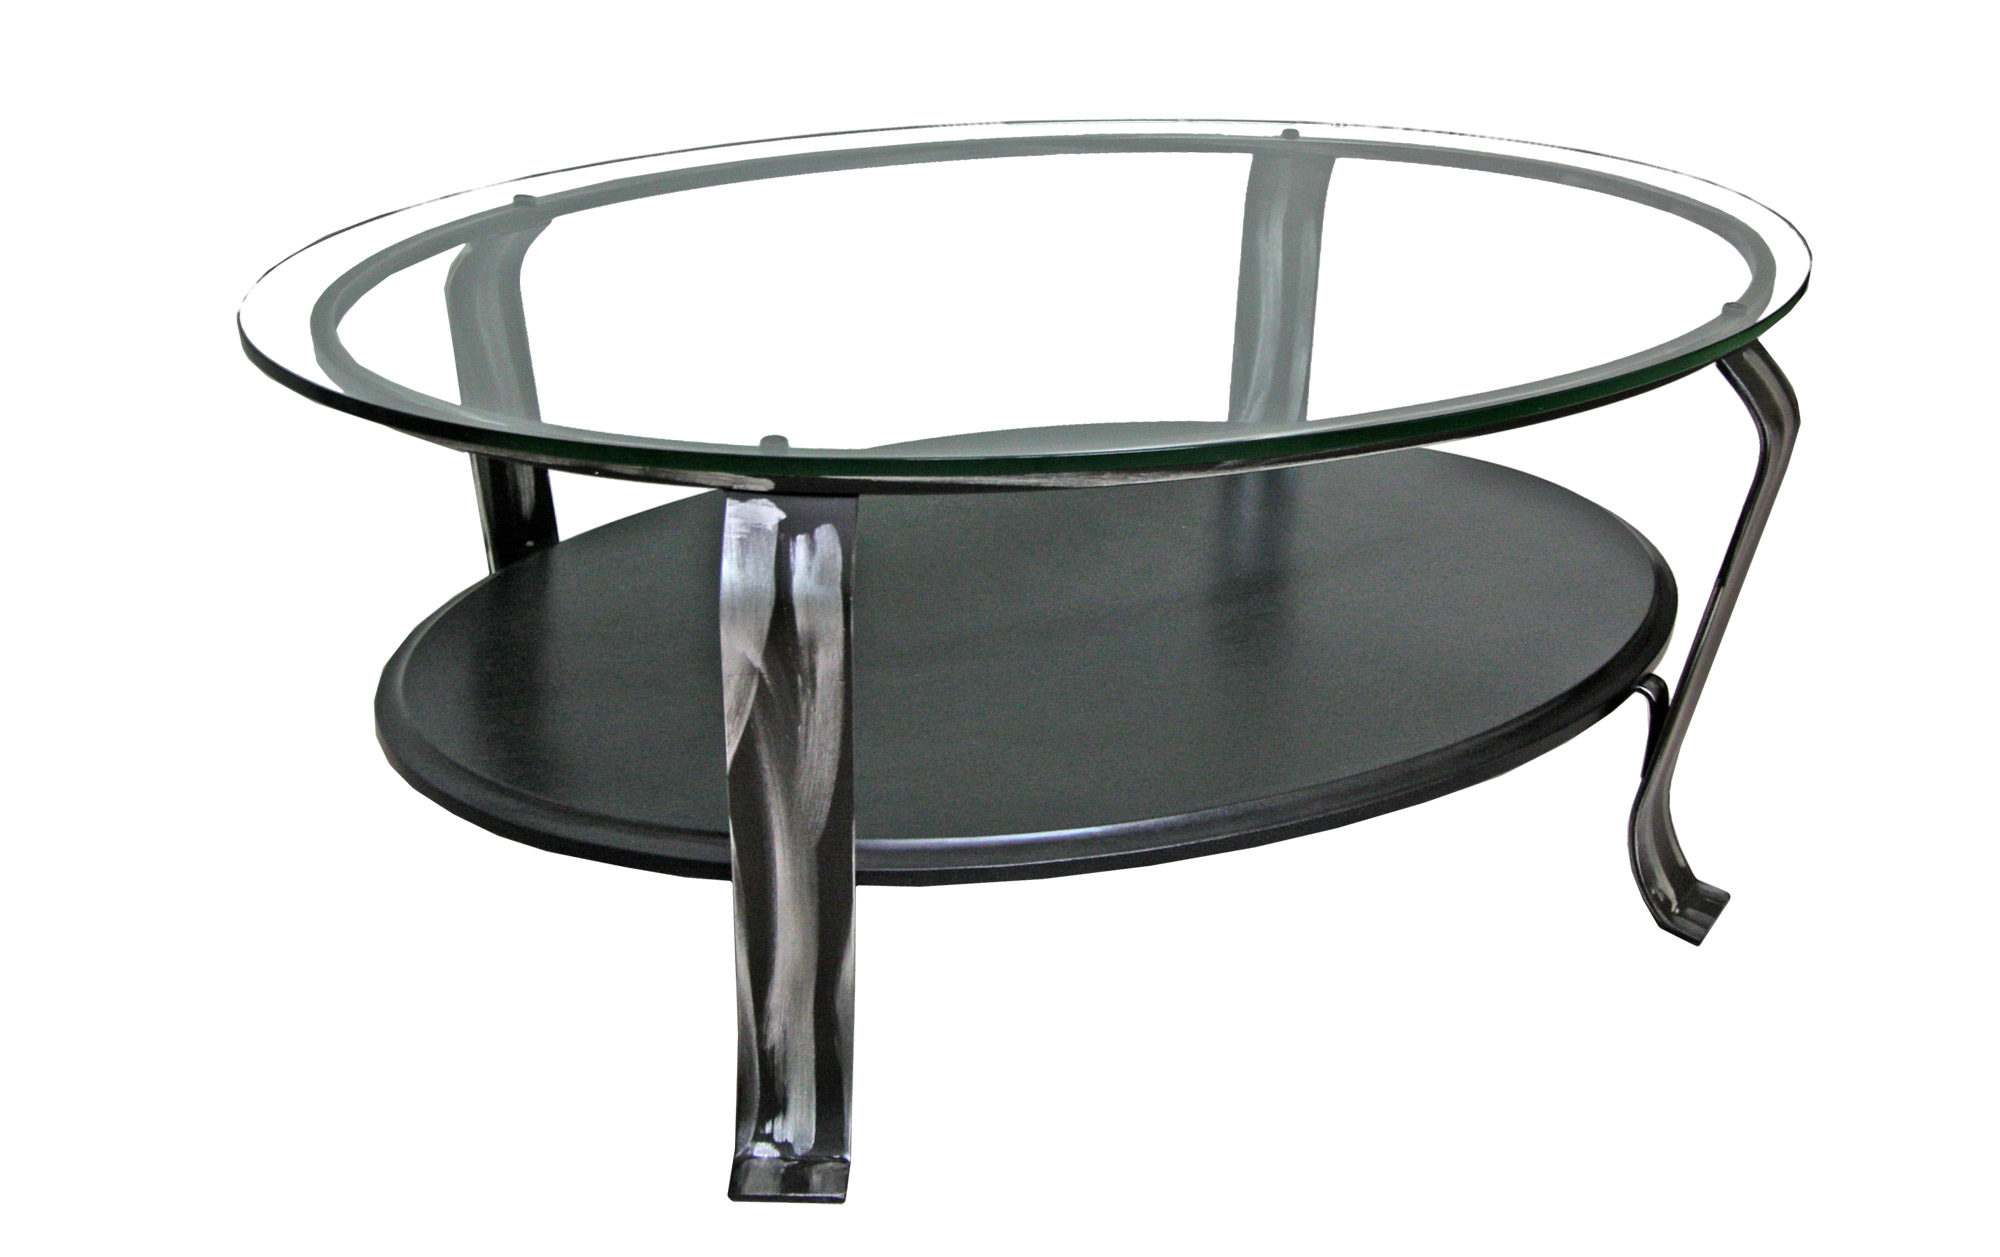 TABLE BASSE VERRE AVEC TABLETTE